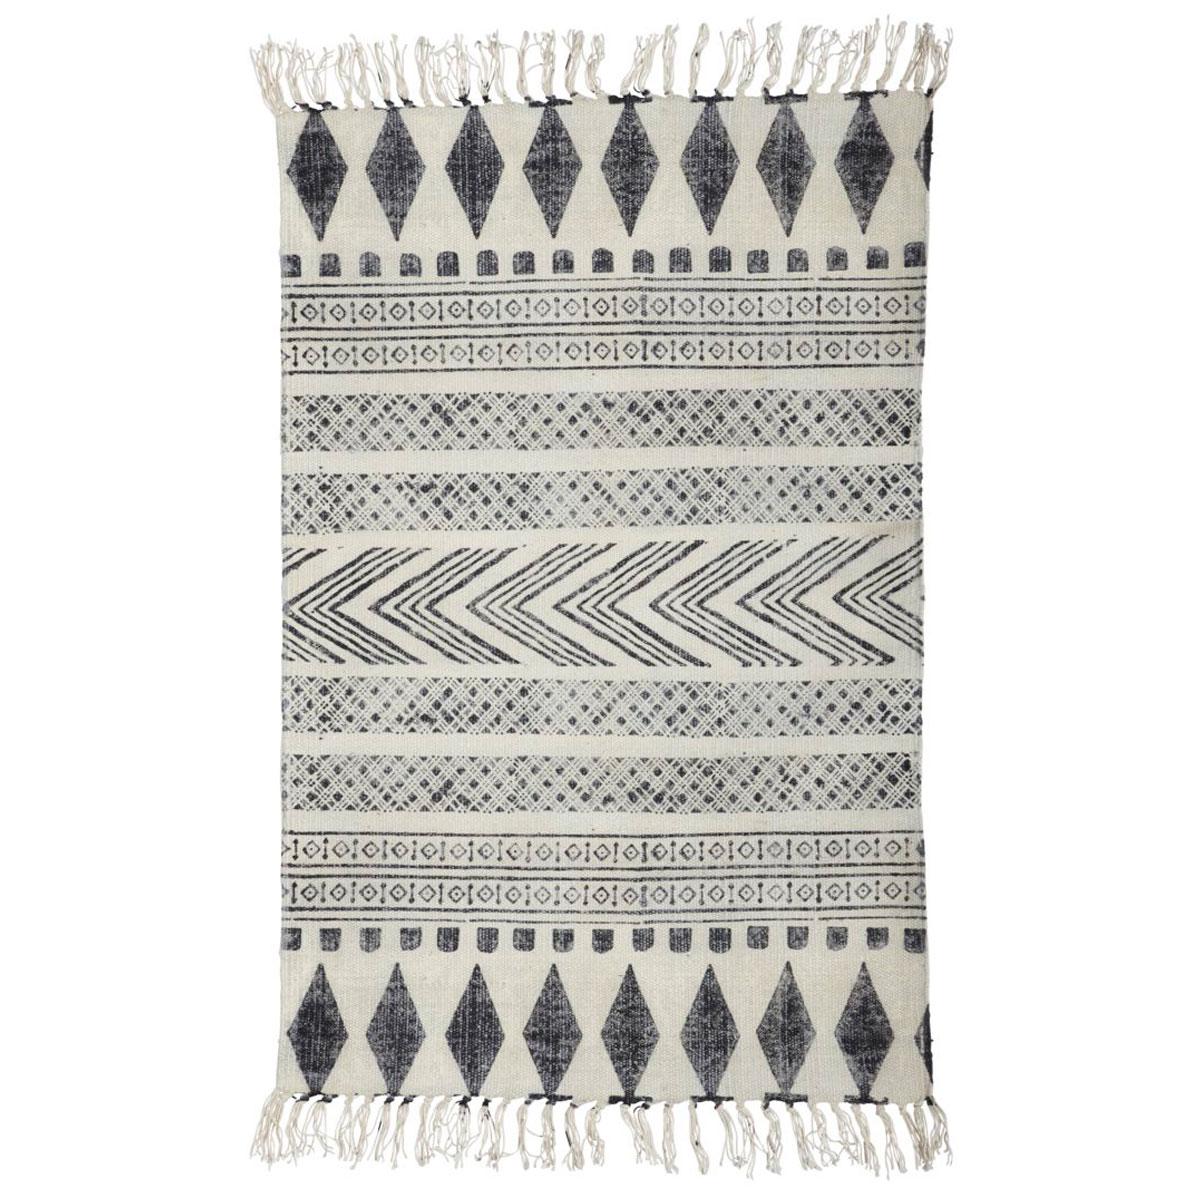 Tapete Block, algodão, branco/preto, 230x160